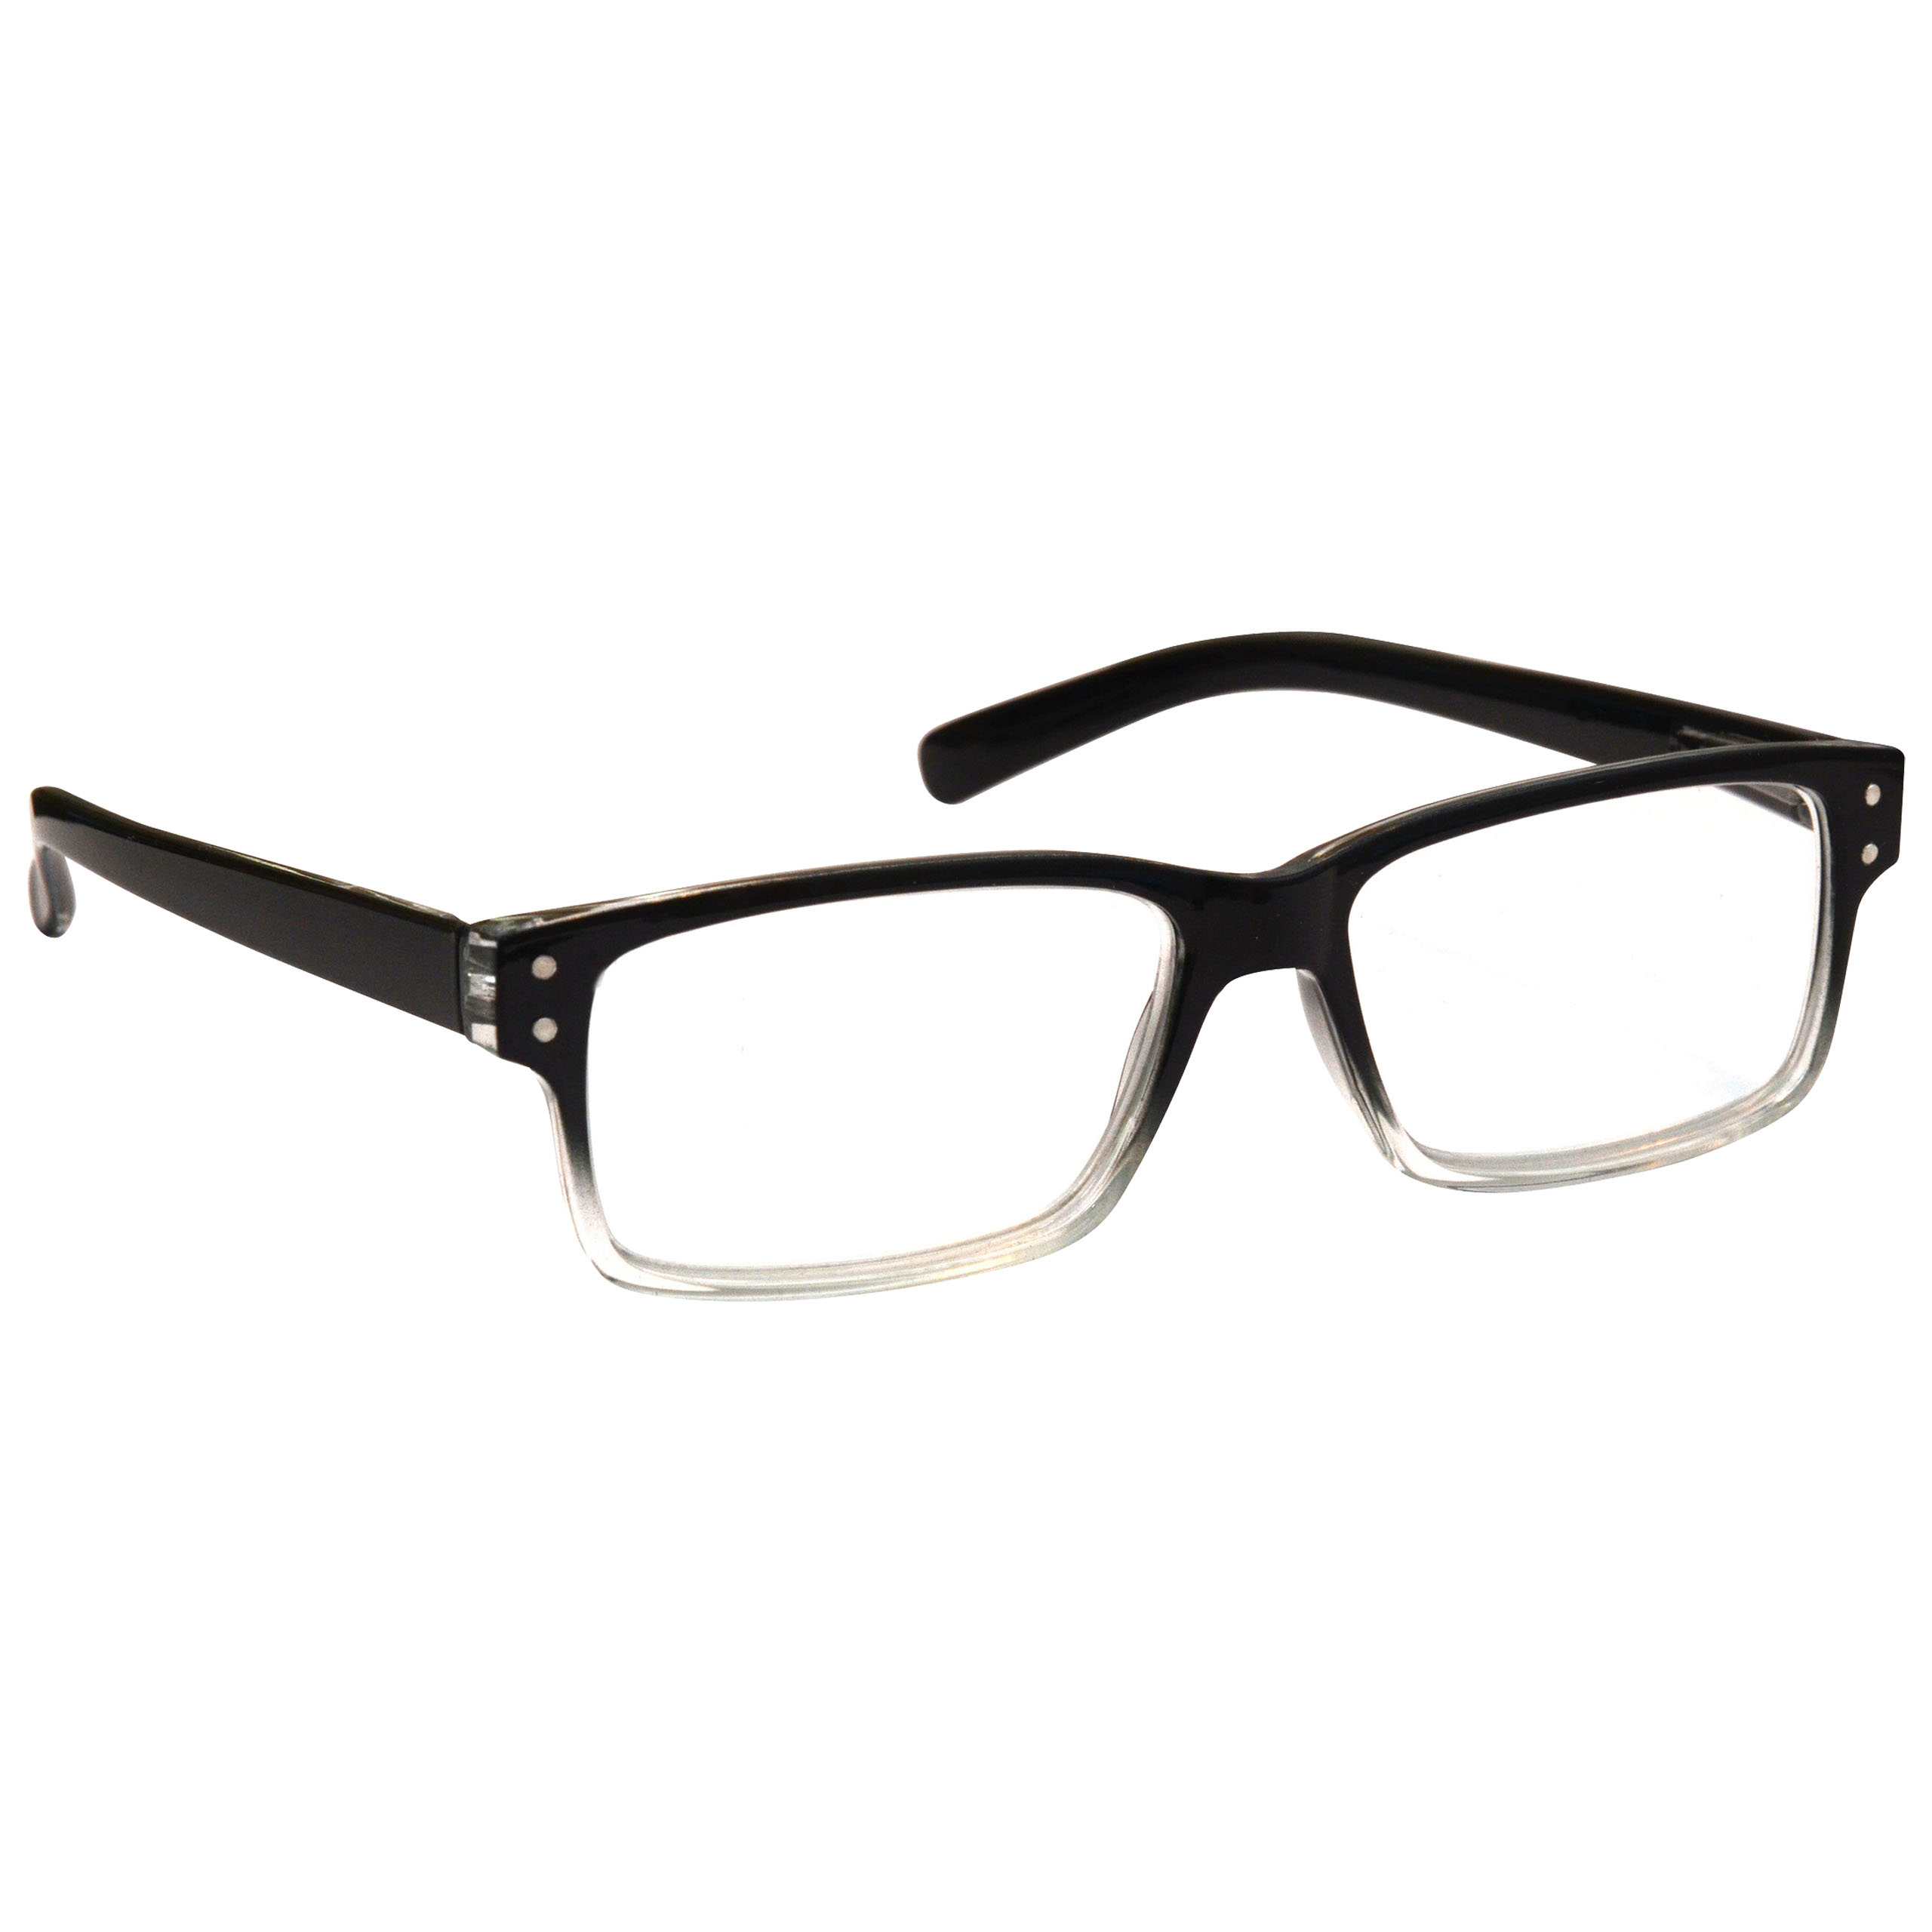 5a02c1edbbf9 Mens Wayfarer Reading Glasses